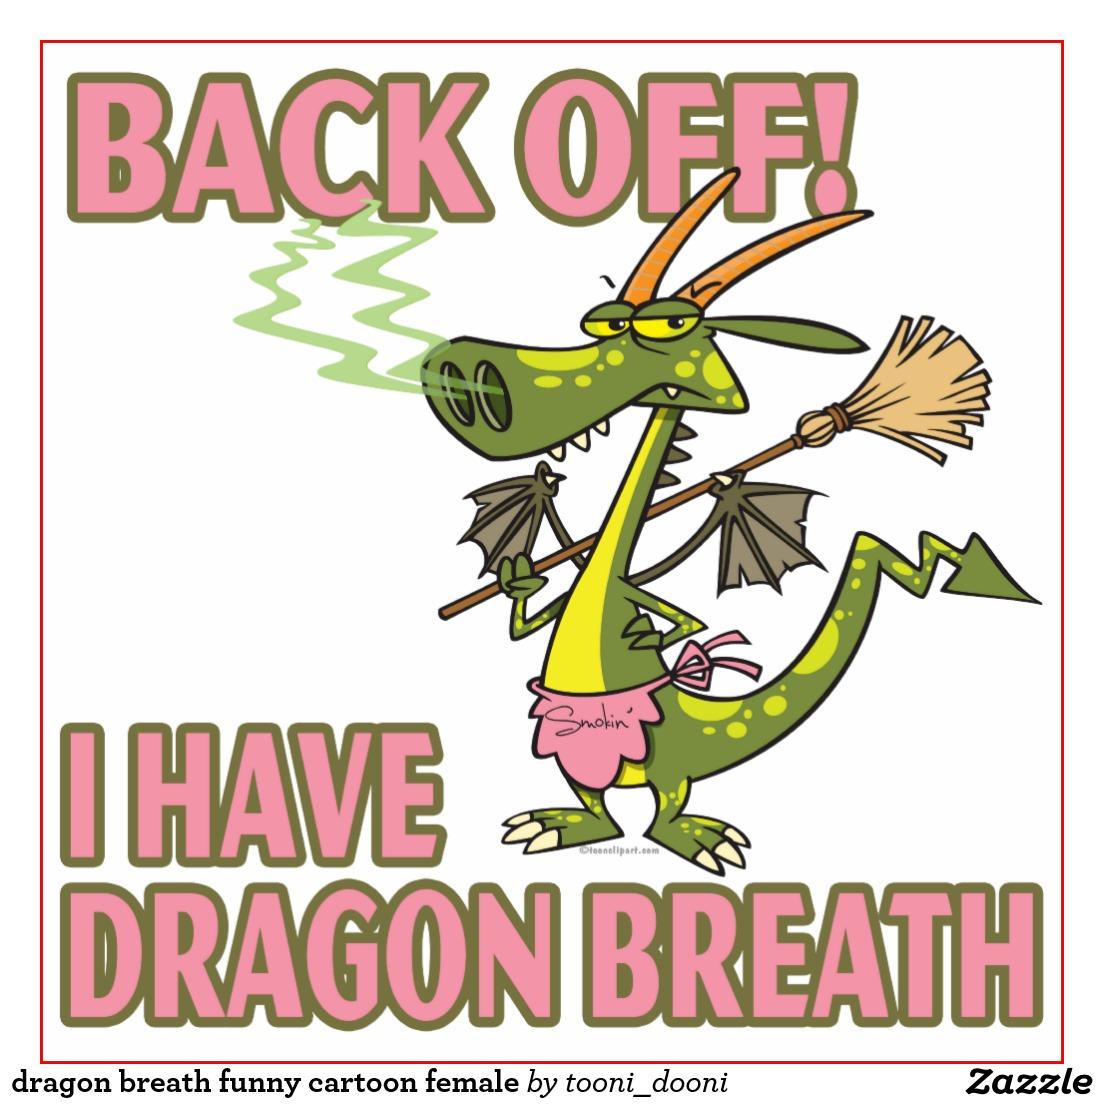 wpid-dragon_breath_funny_cartoon_female_photo_cut_outs-r5d41002b30d540129fc23f8e8e079fca_x7slu_1024.jpg